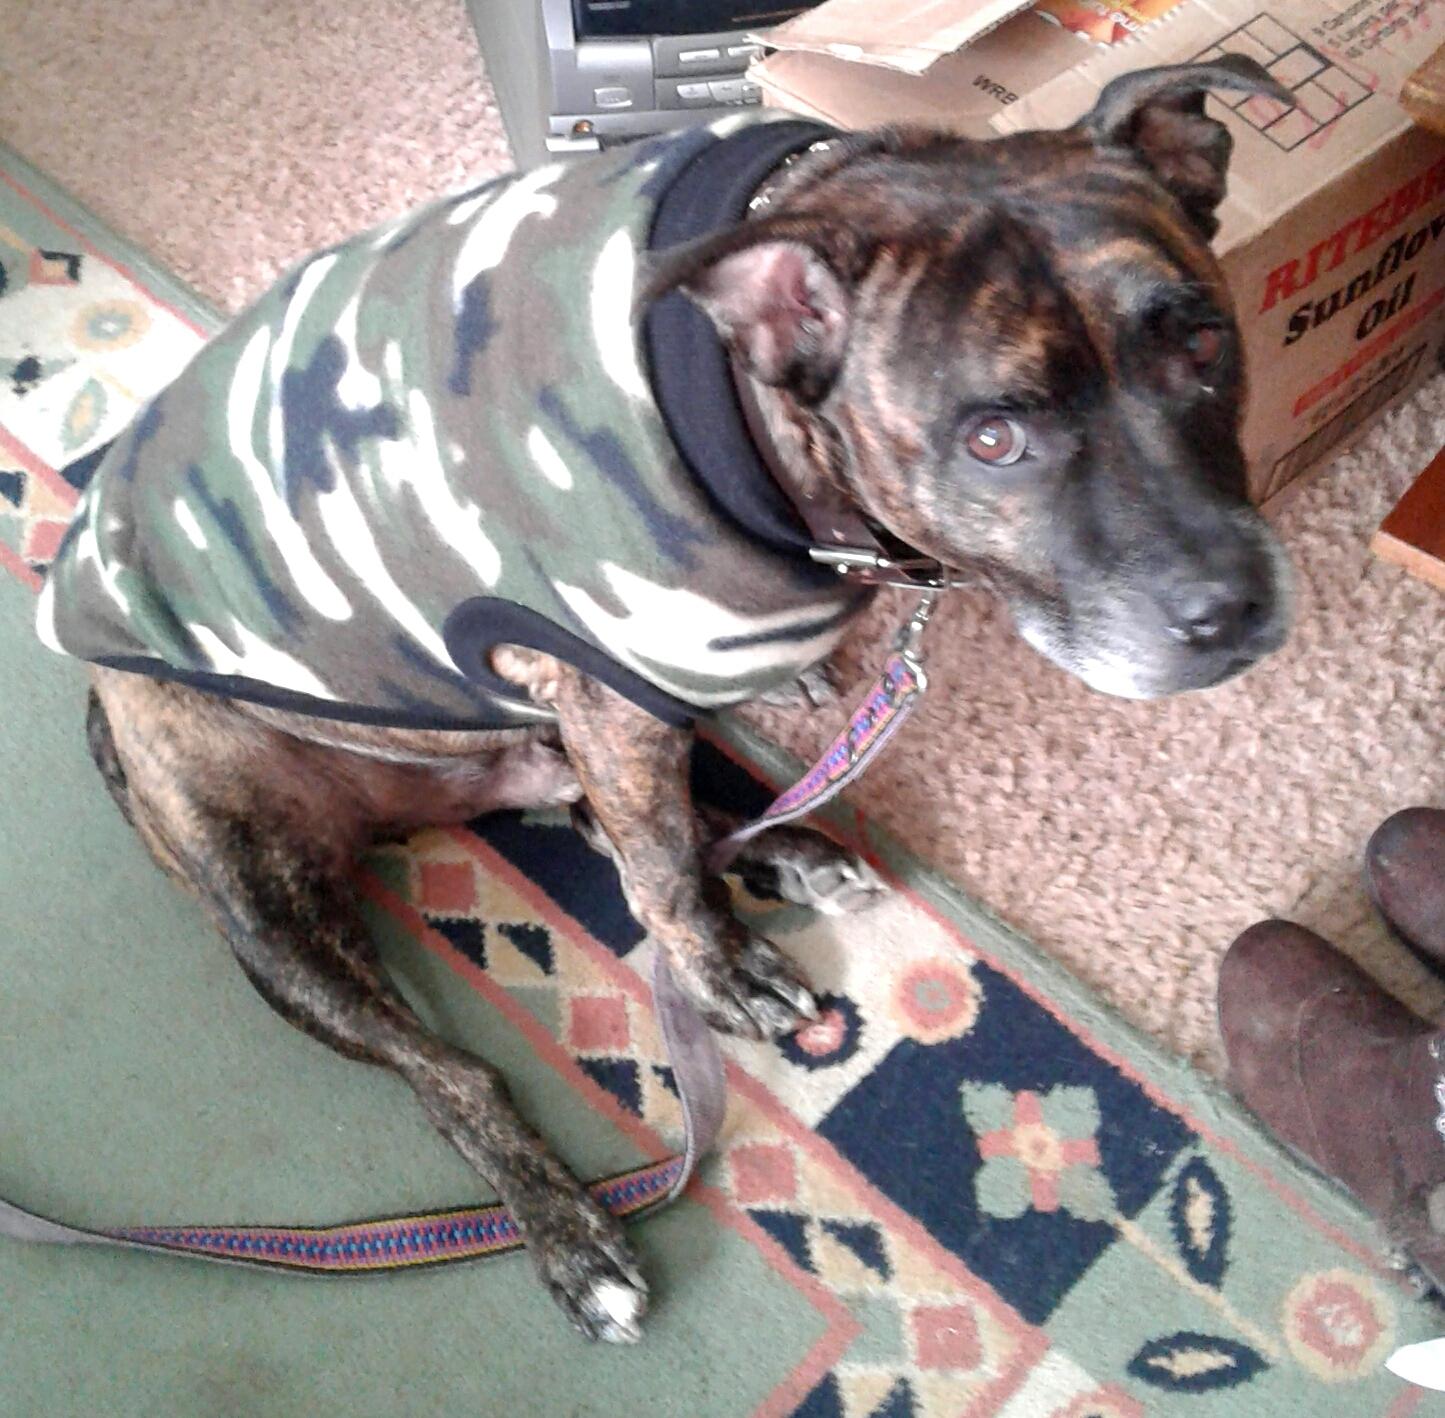 Dog Jackets (Hondejassies) for all Breeds